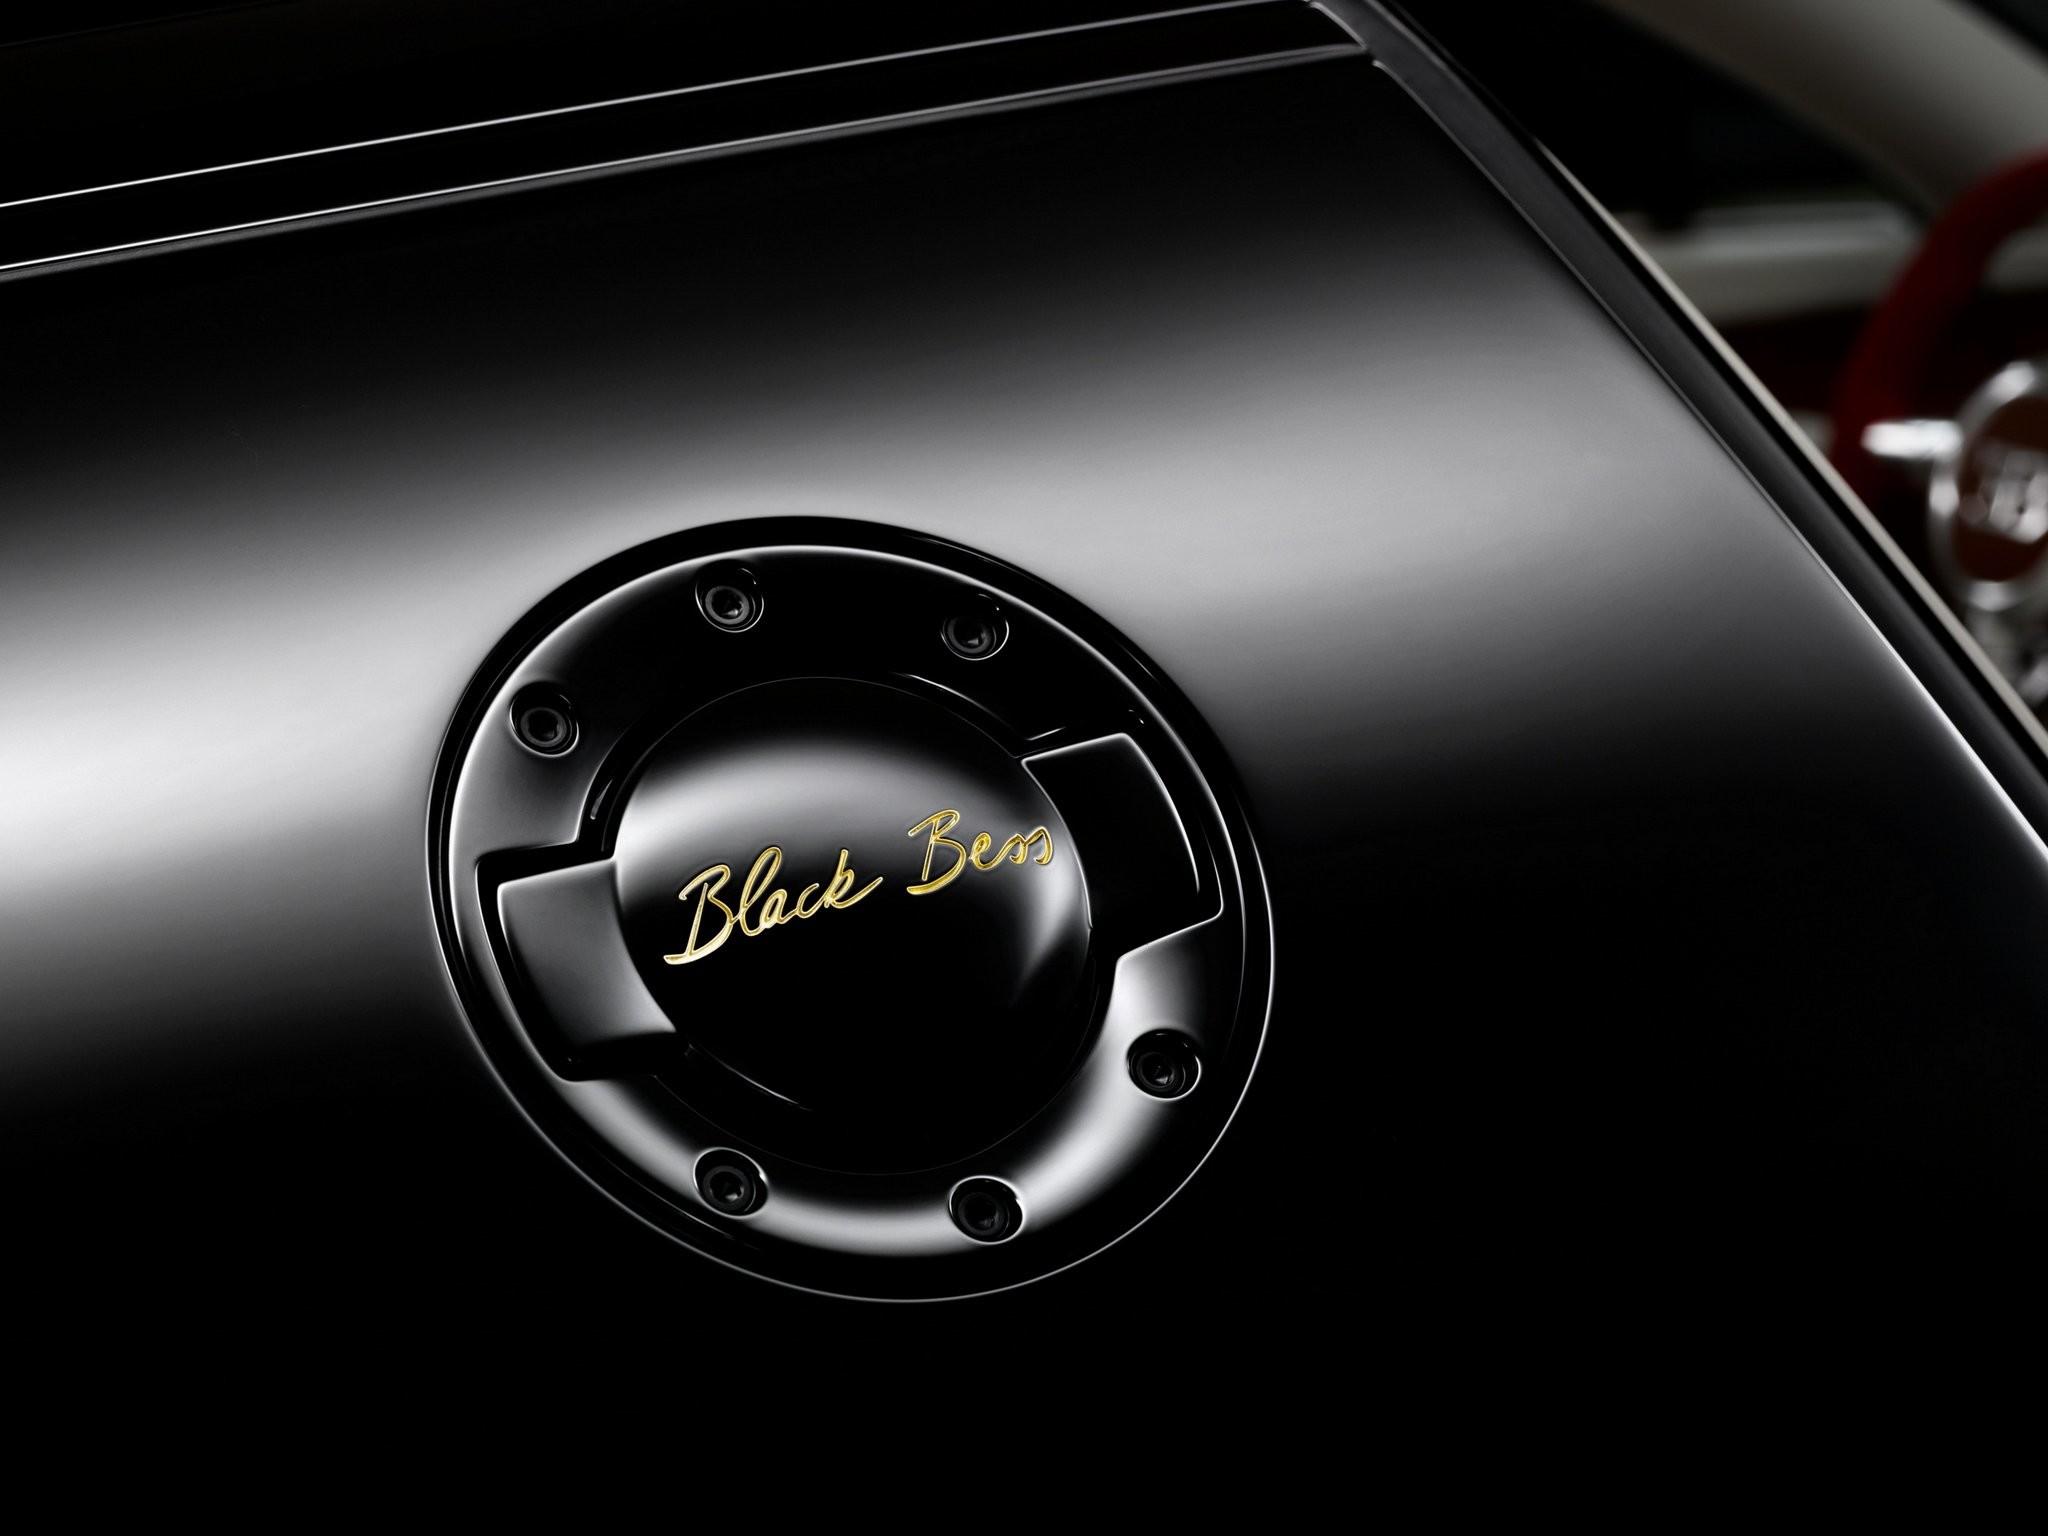 2014 Bugatti Veyron Grand Sport Roadster Vitesse Black Bess Supercar Logo  Poster F Wallpaper 331959 Wallpaperup